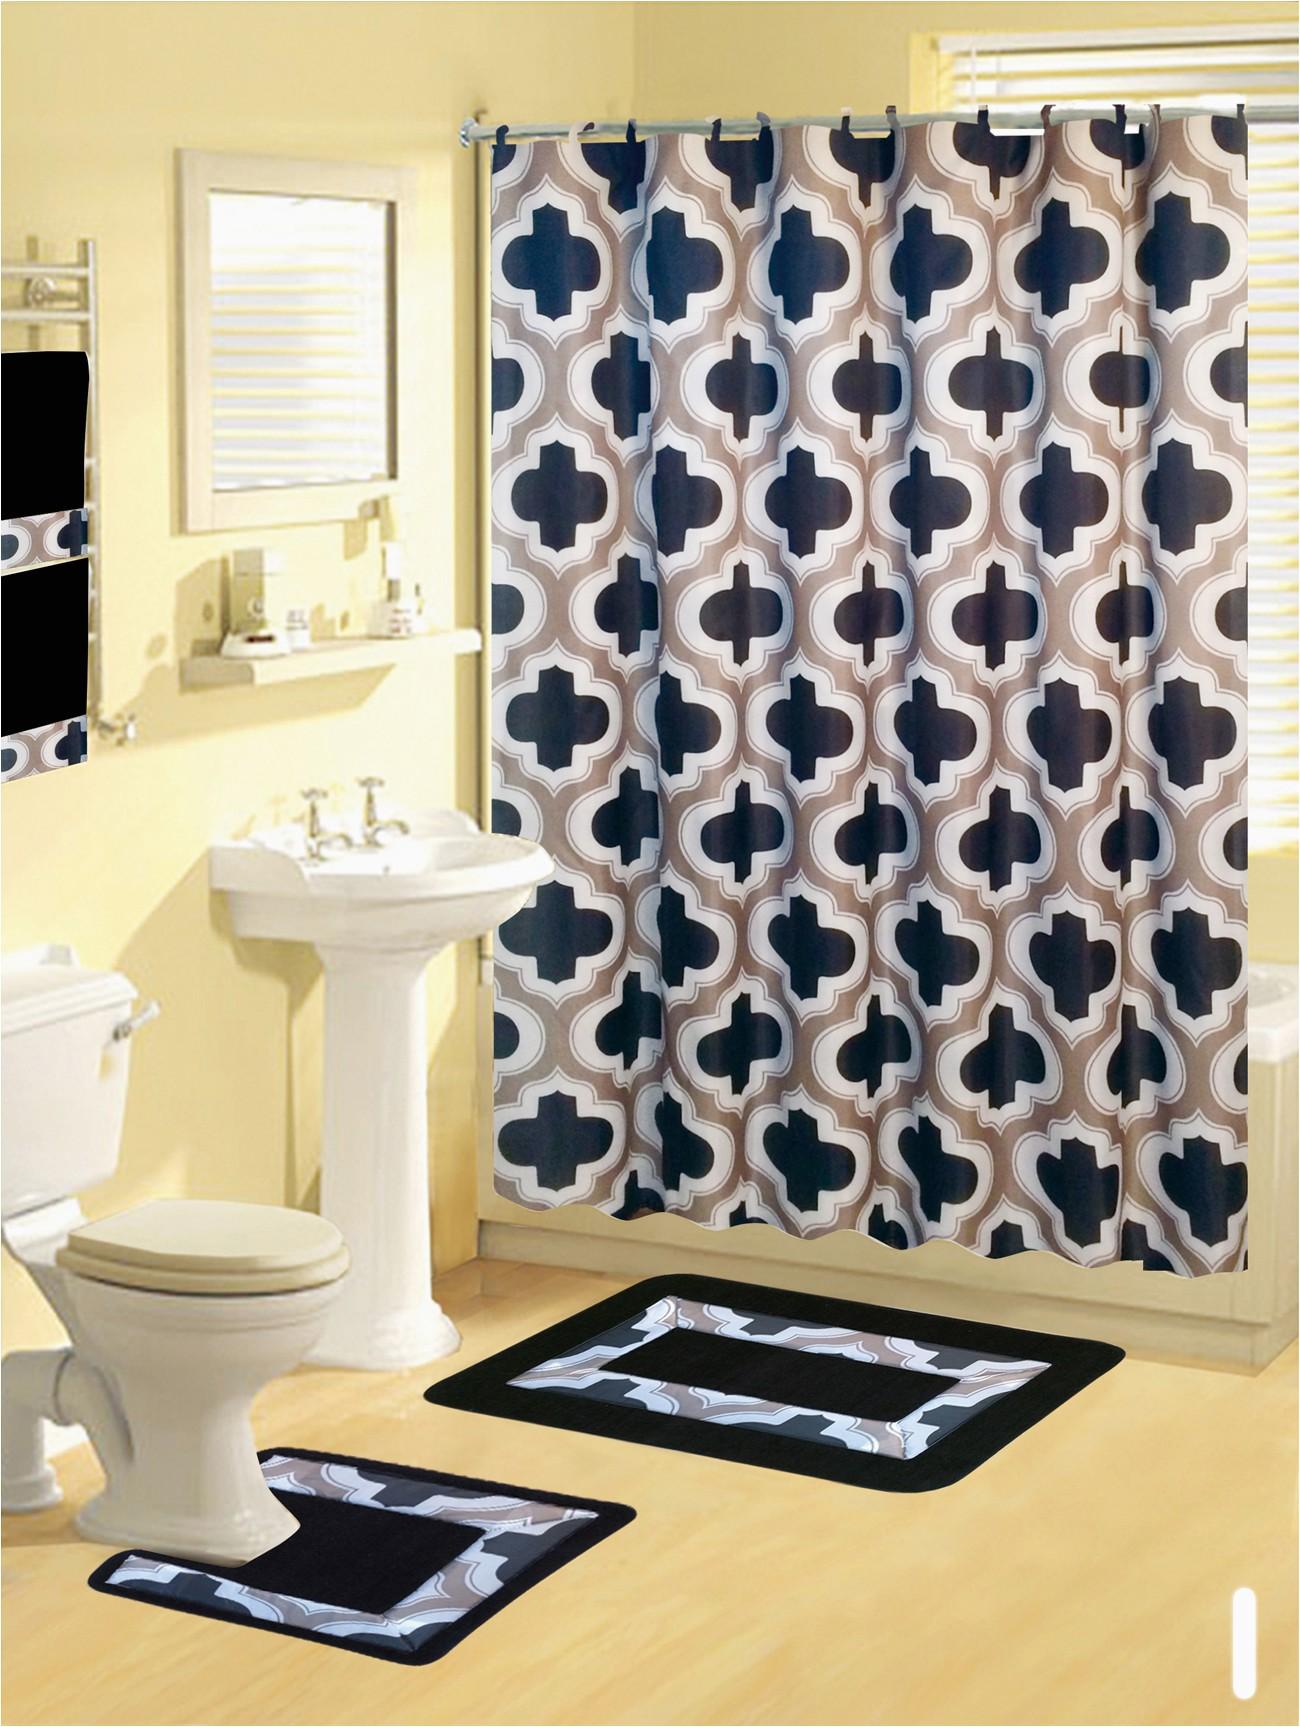 Contemporary Bath Rug Sets Shower Curtains 17 Pcs Set Contemporary Bath Mat Contour Rug Hooks Hand towels Walmart